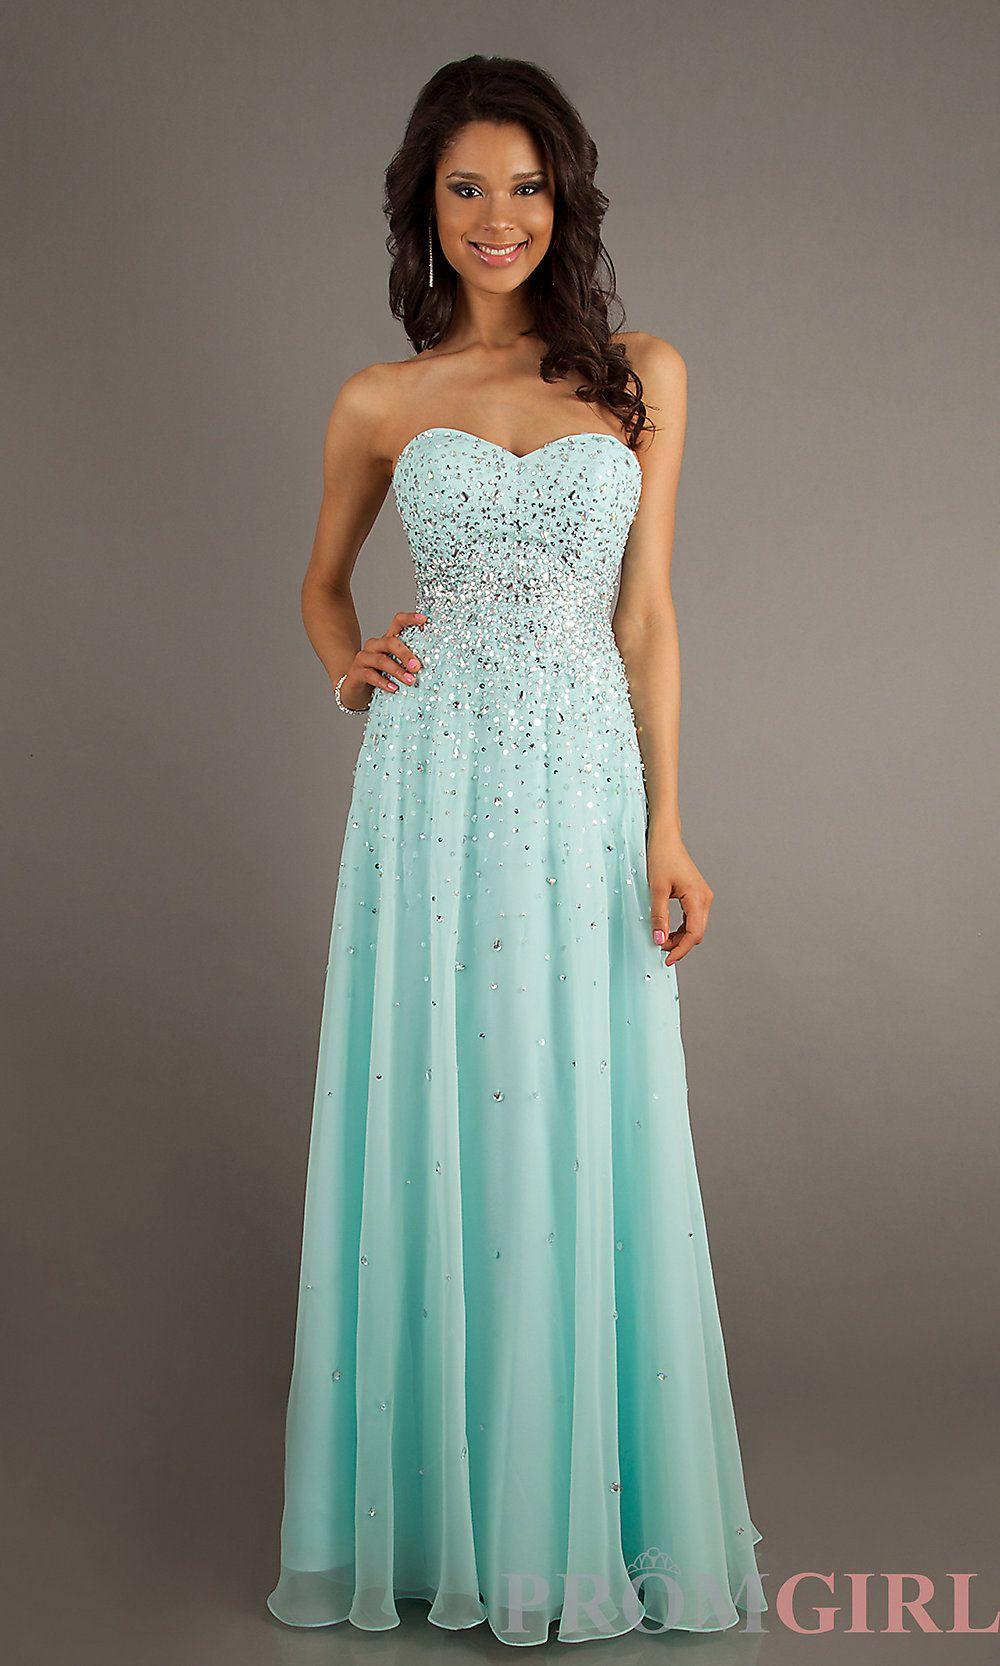 Strapless beaded gowns mori lee long strapless dresses promgirl